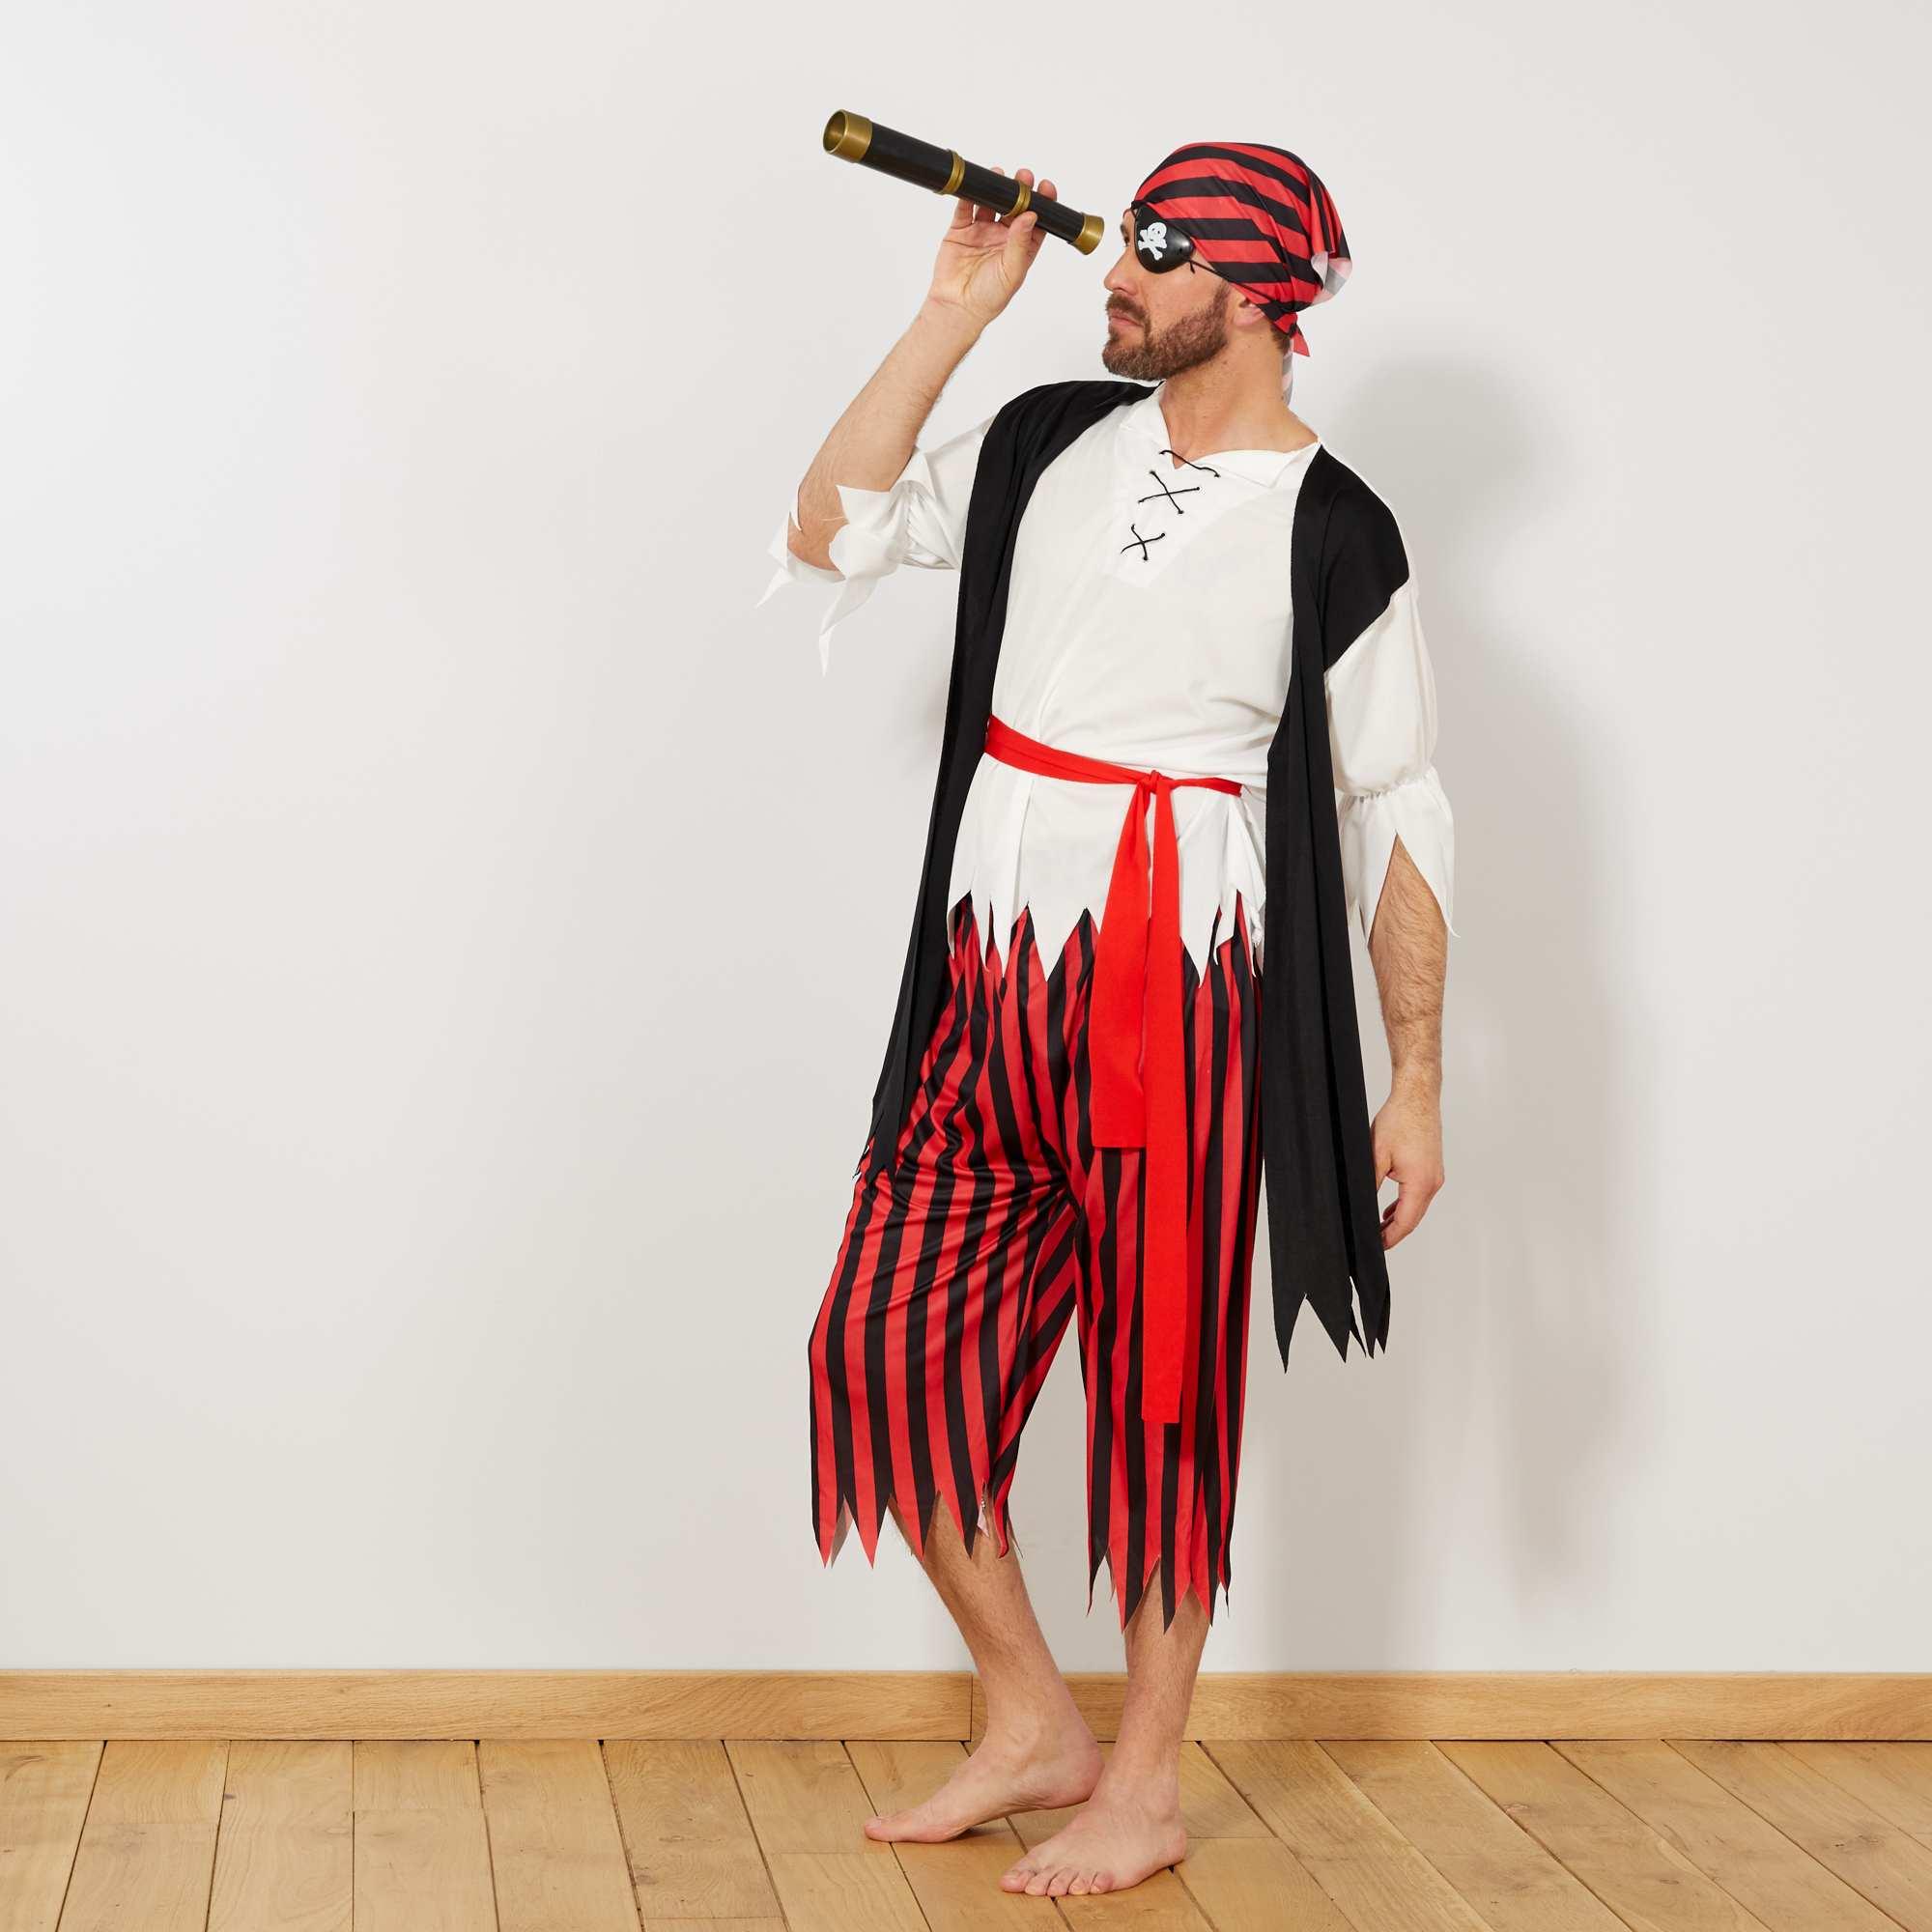 Disfraz de Pirata Sexy para mujer - Envo en 24h